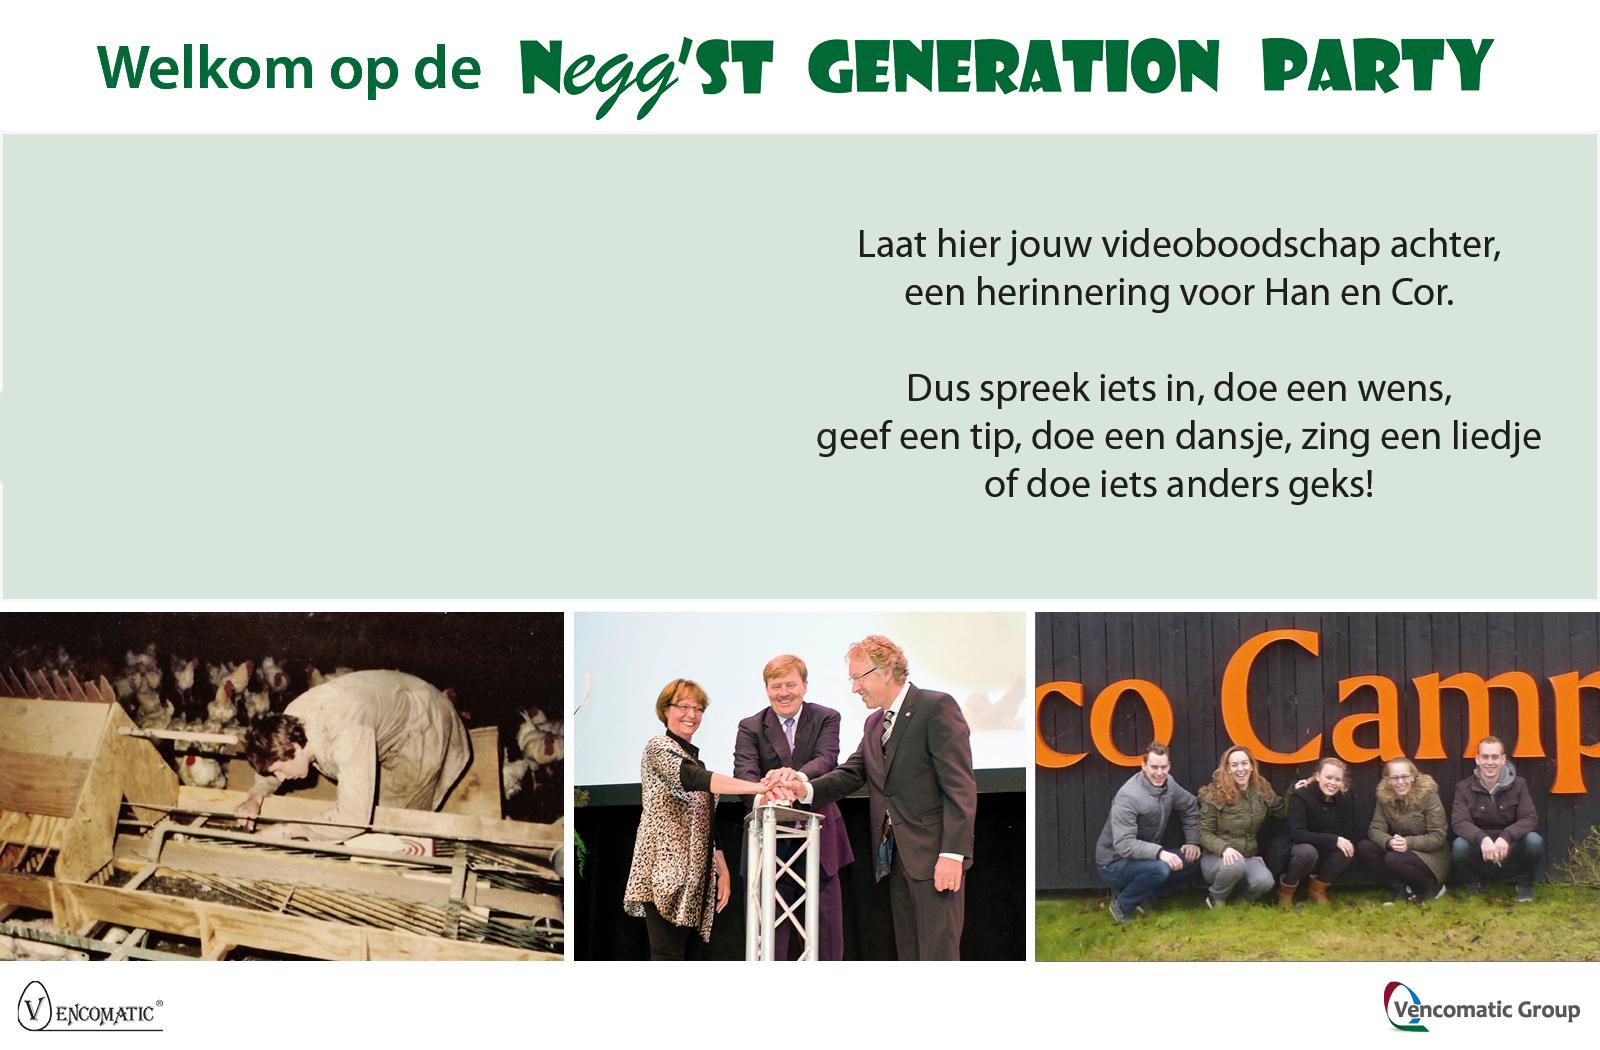 opnamestartscherm Negg'st generation